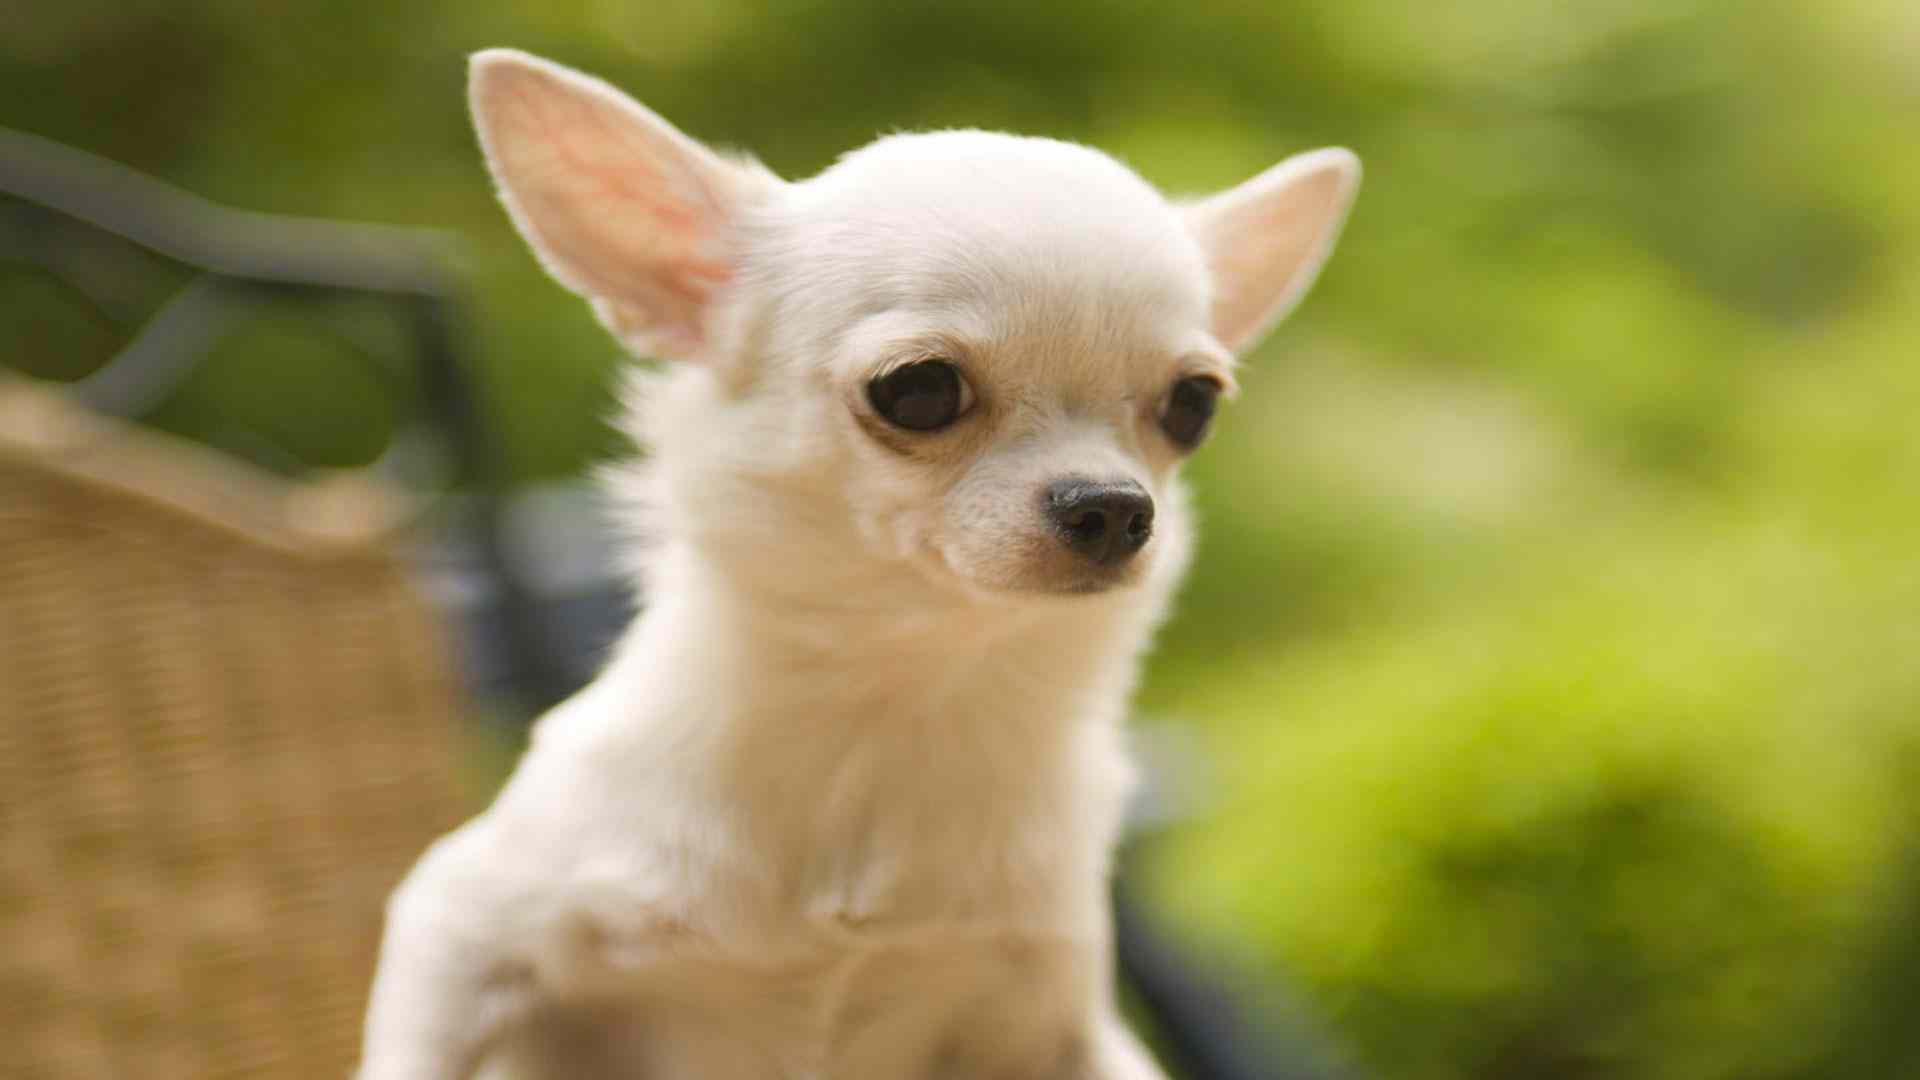 hd pics photos cute white chihuahua dog beautiful hd quality desktop  background wallpaper